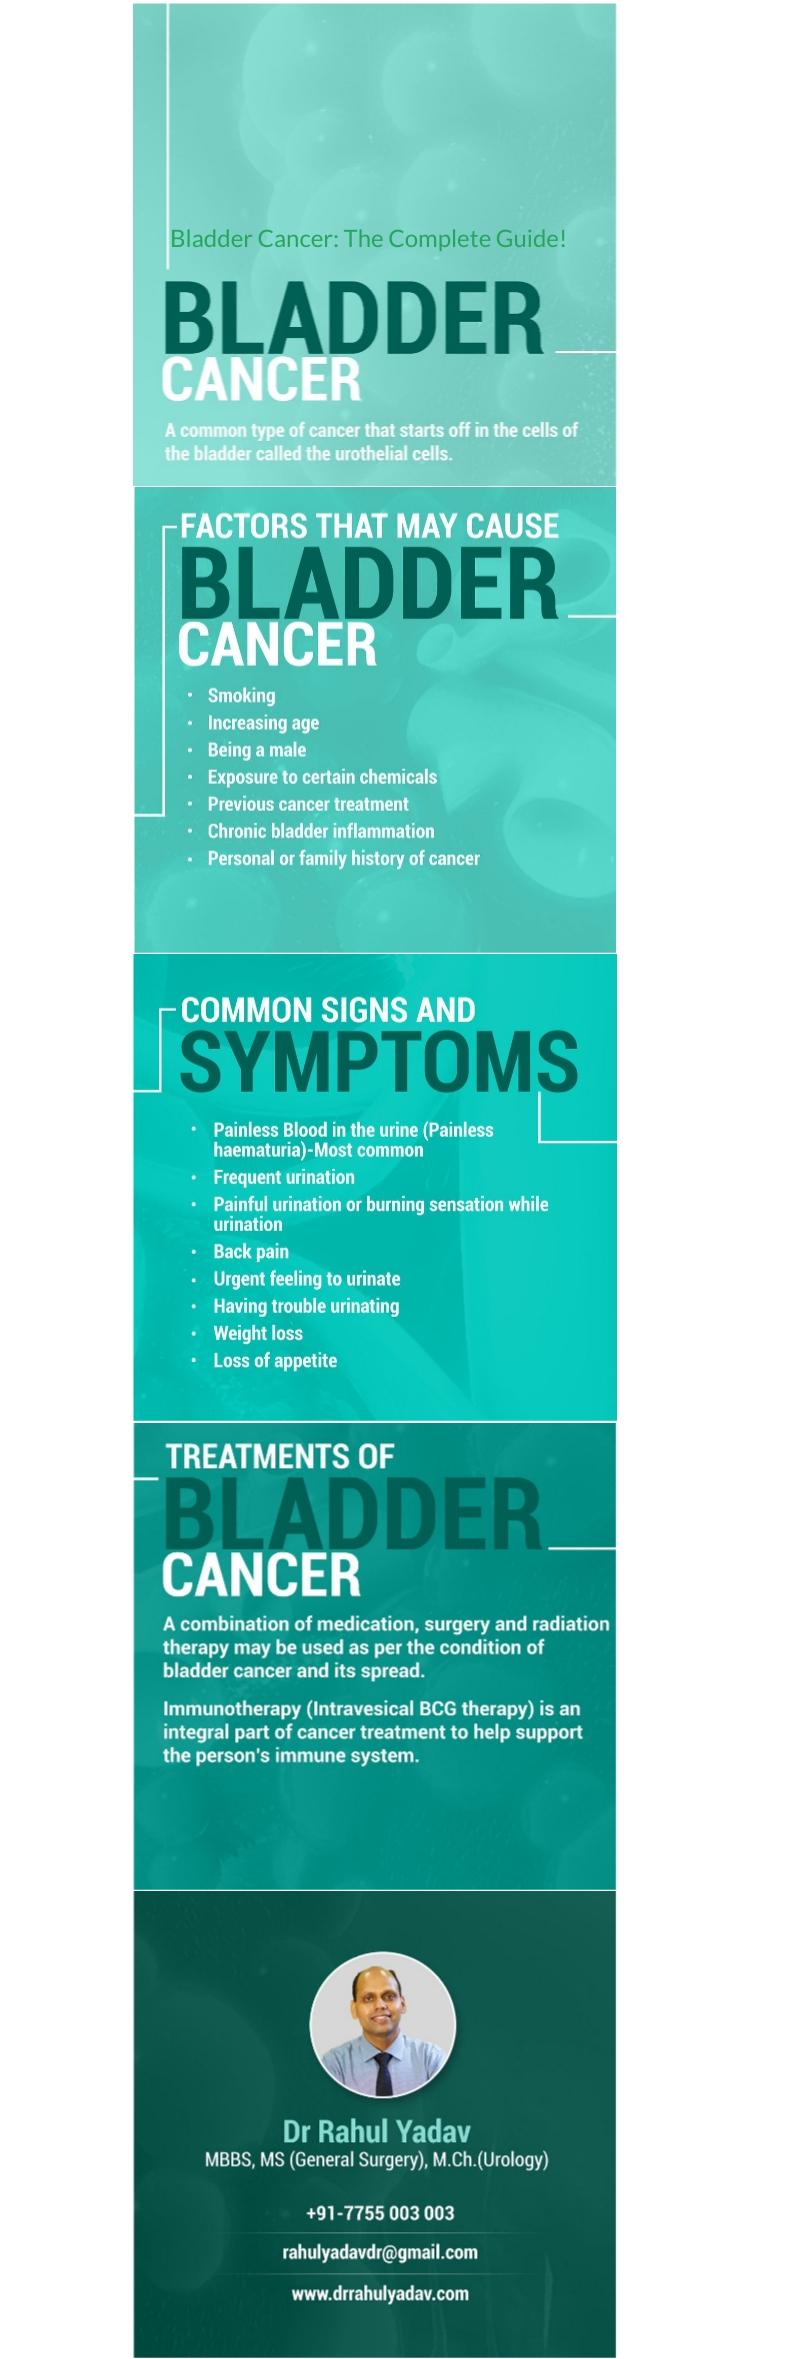 Bladder Cancer: The Complete Guide!